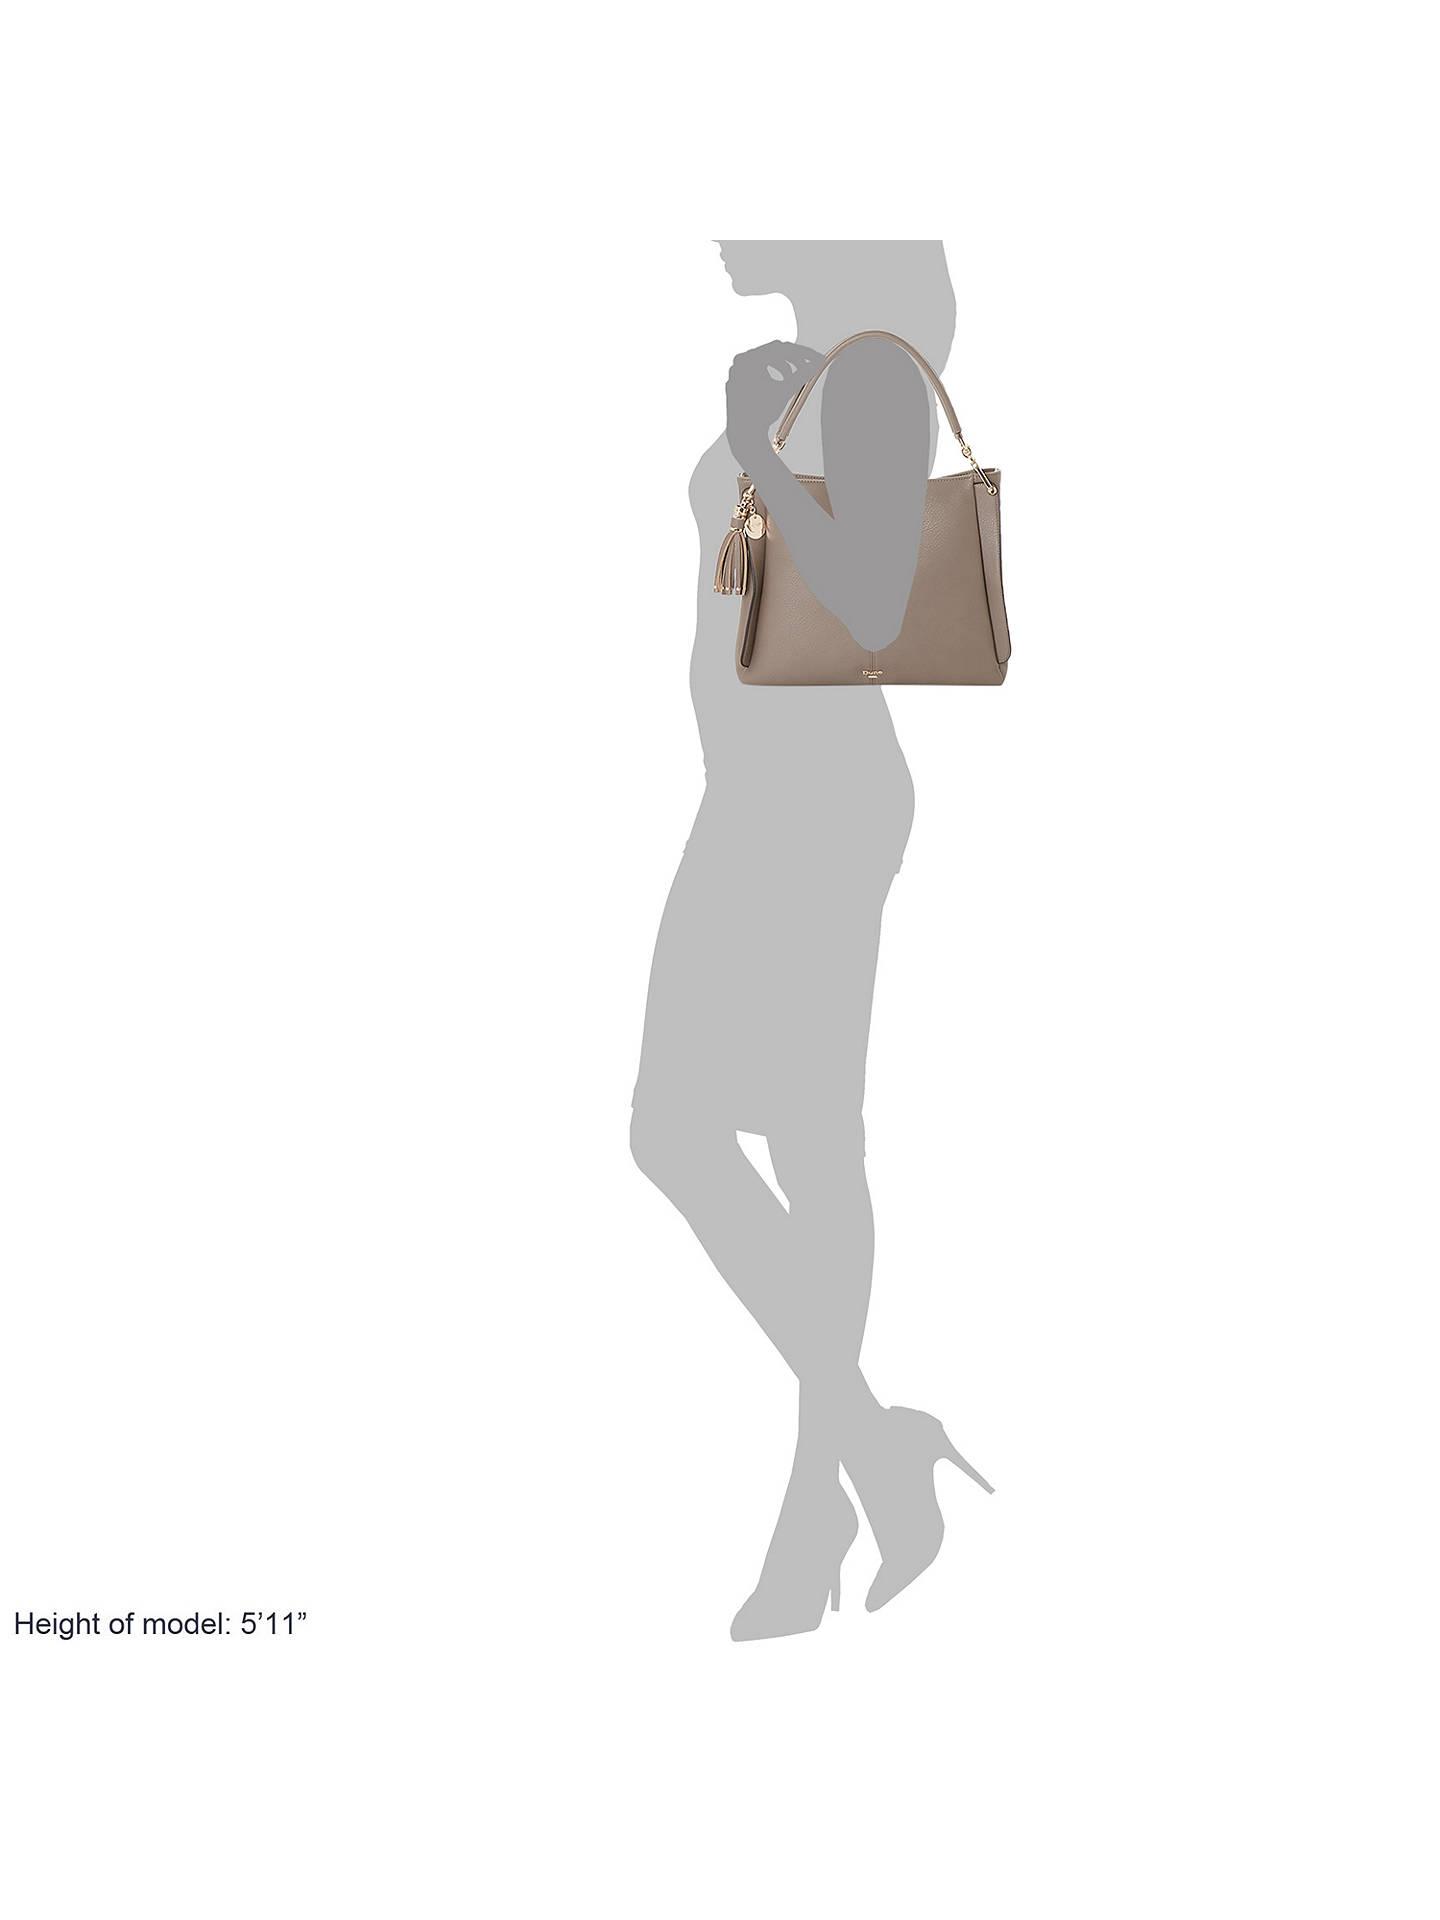 ... BuyDune Disobelle Large Slouch Tassel Grab Bag 59b647d2a7b54